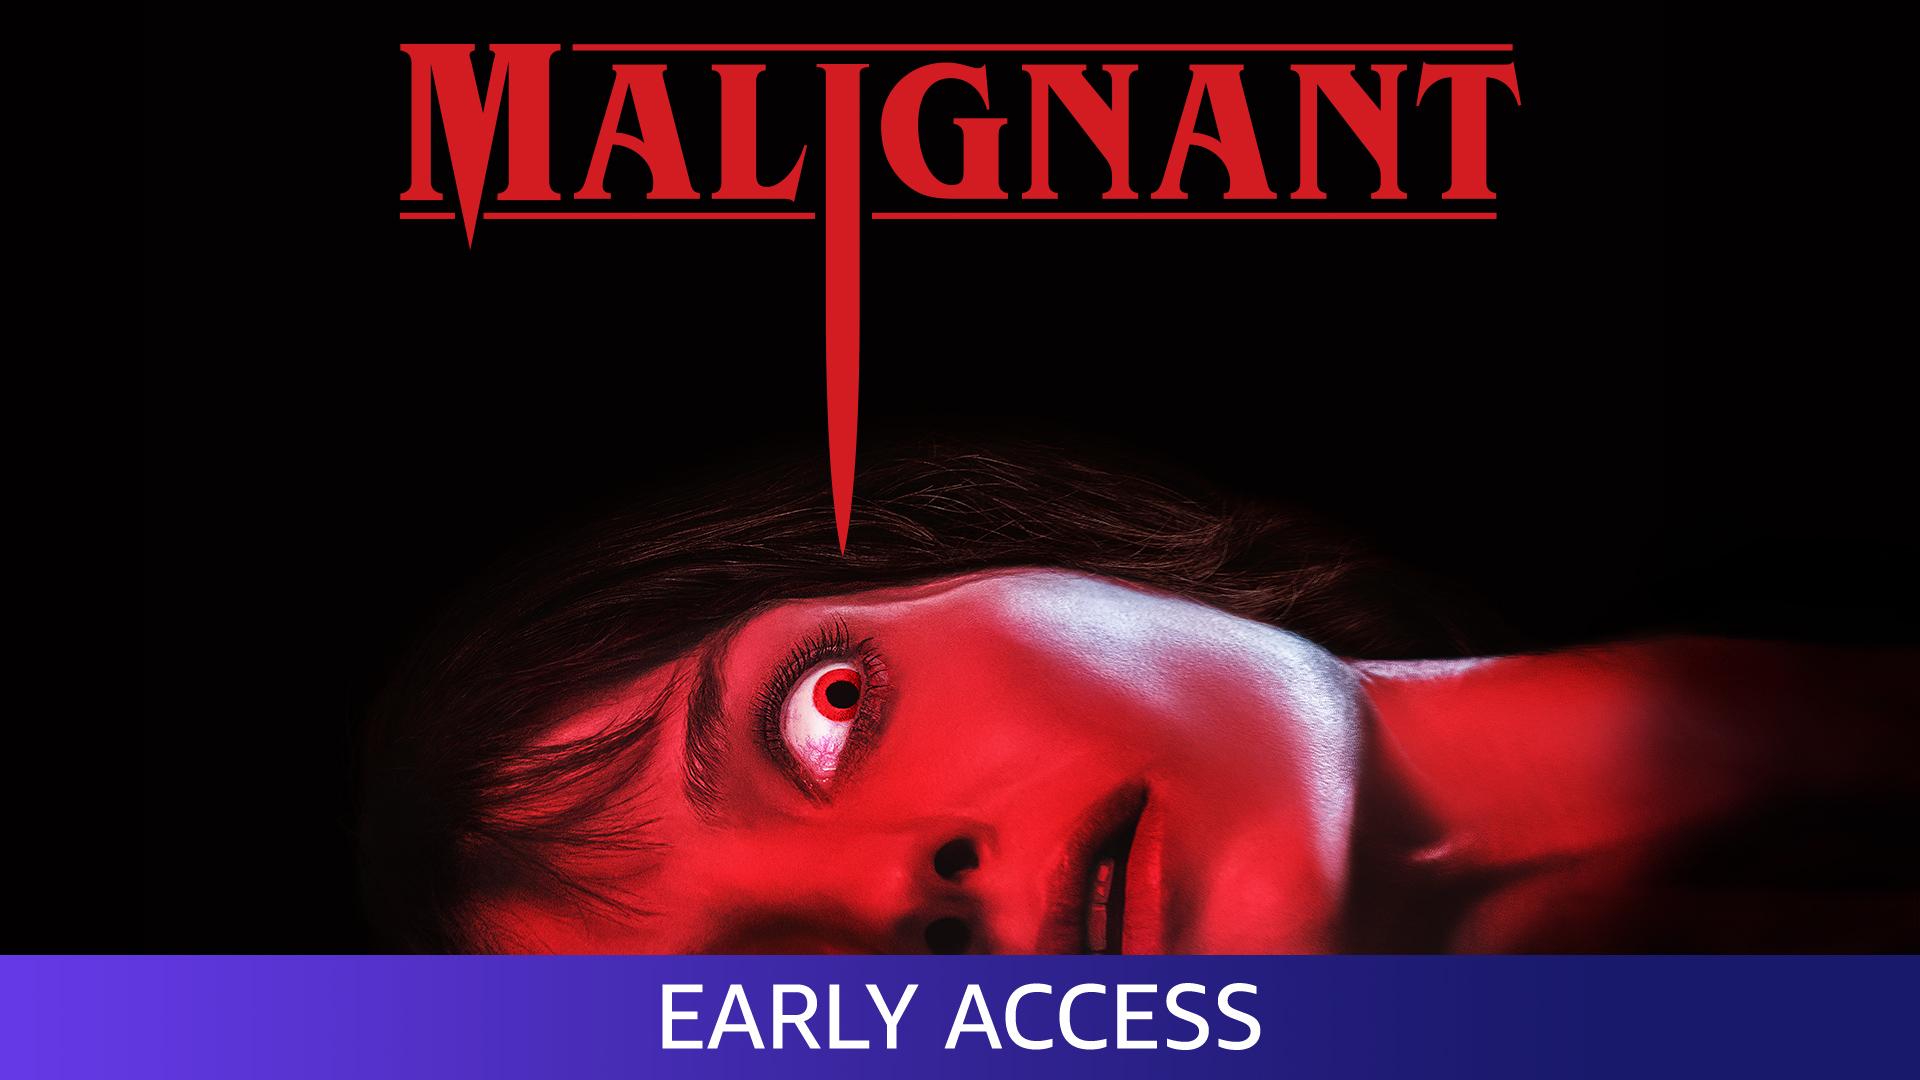 Malignant (4K UHD)